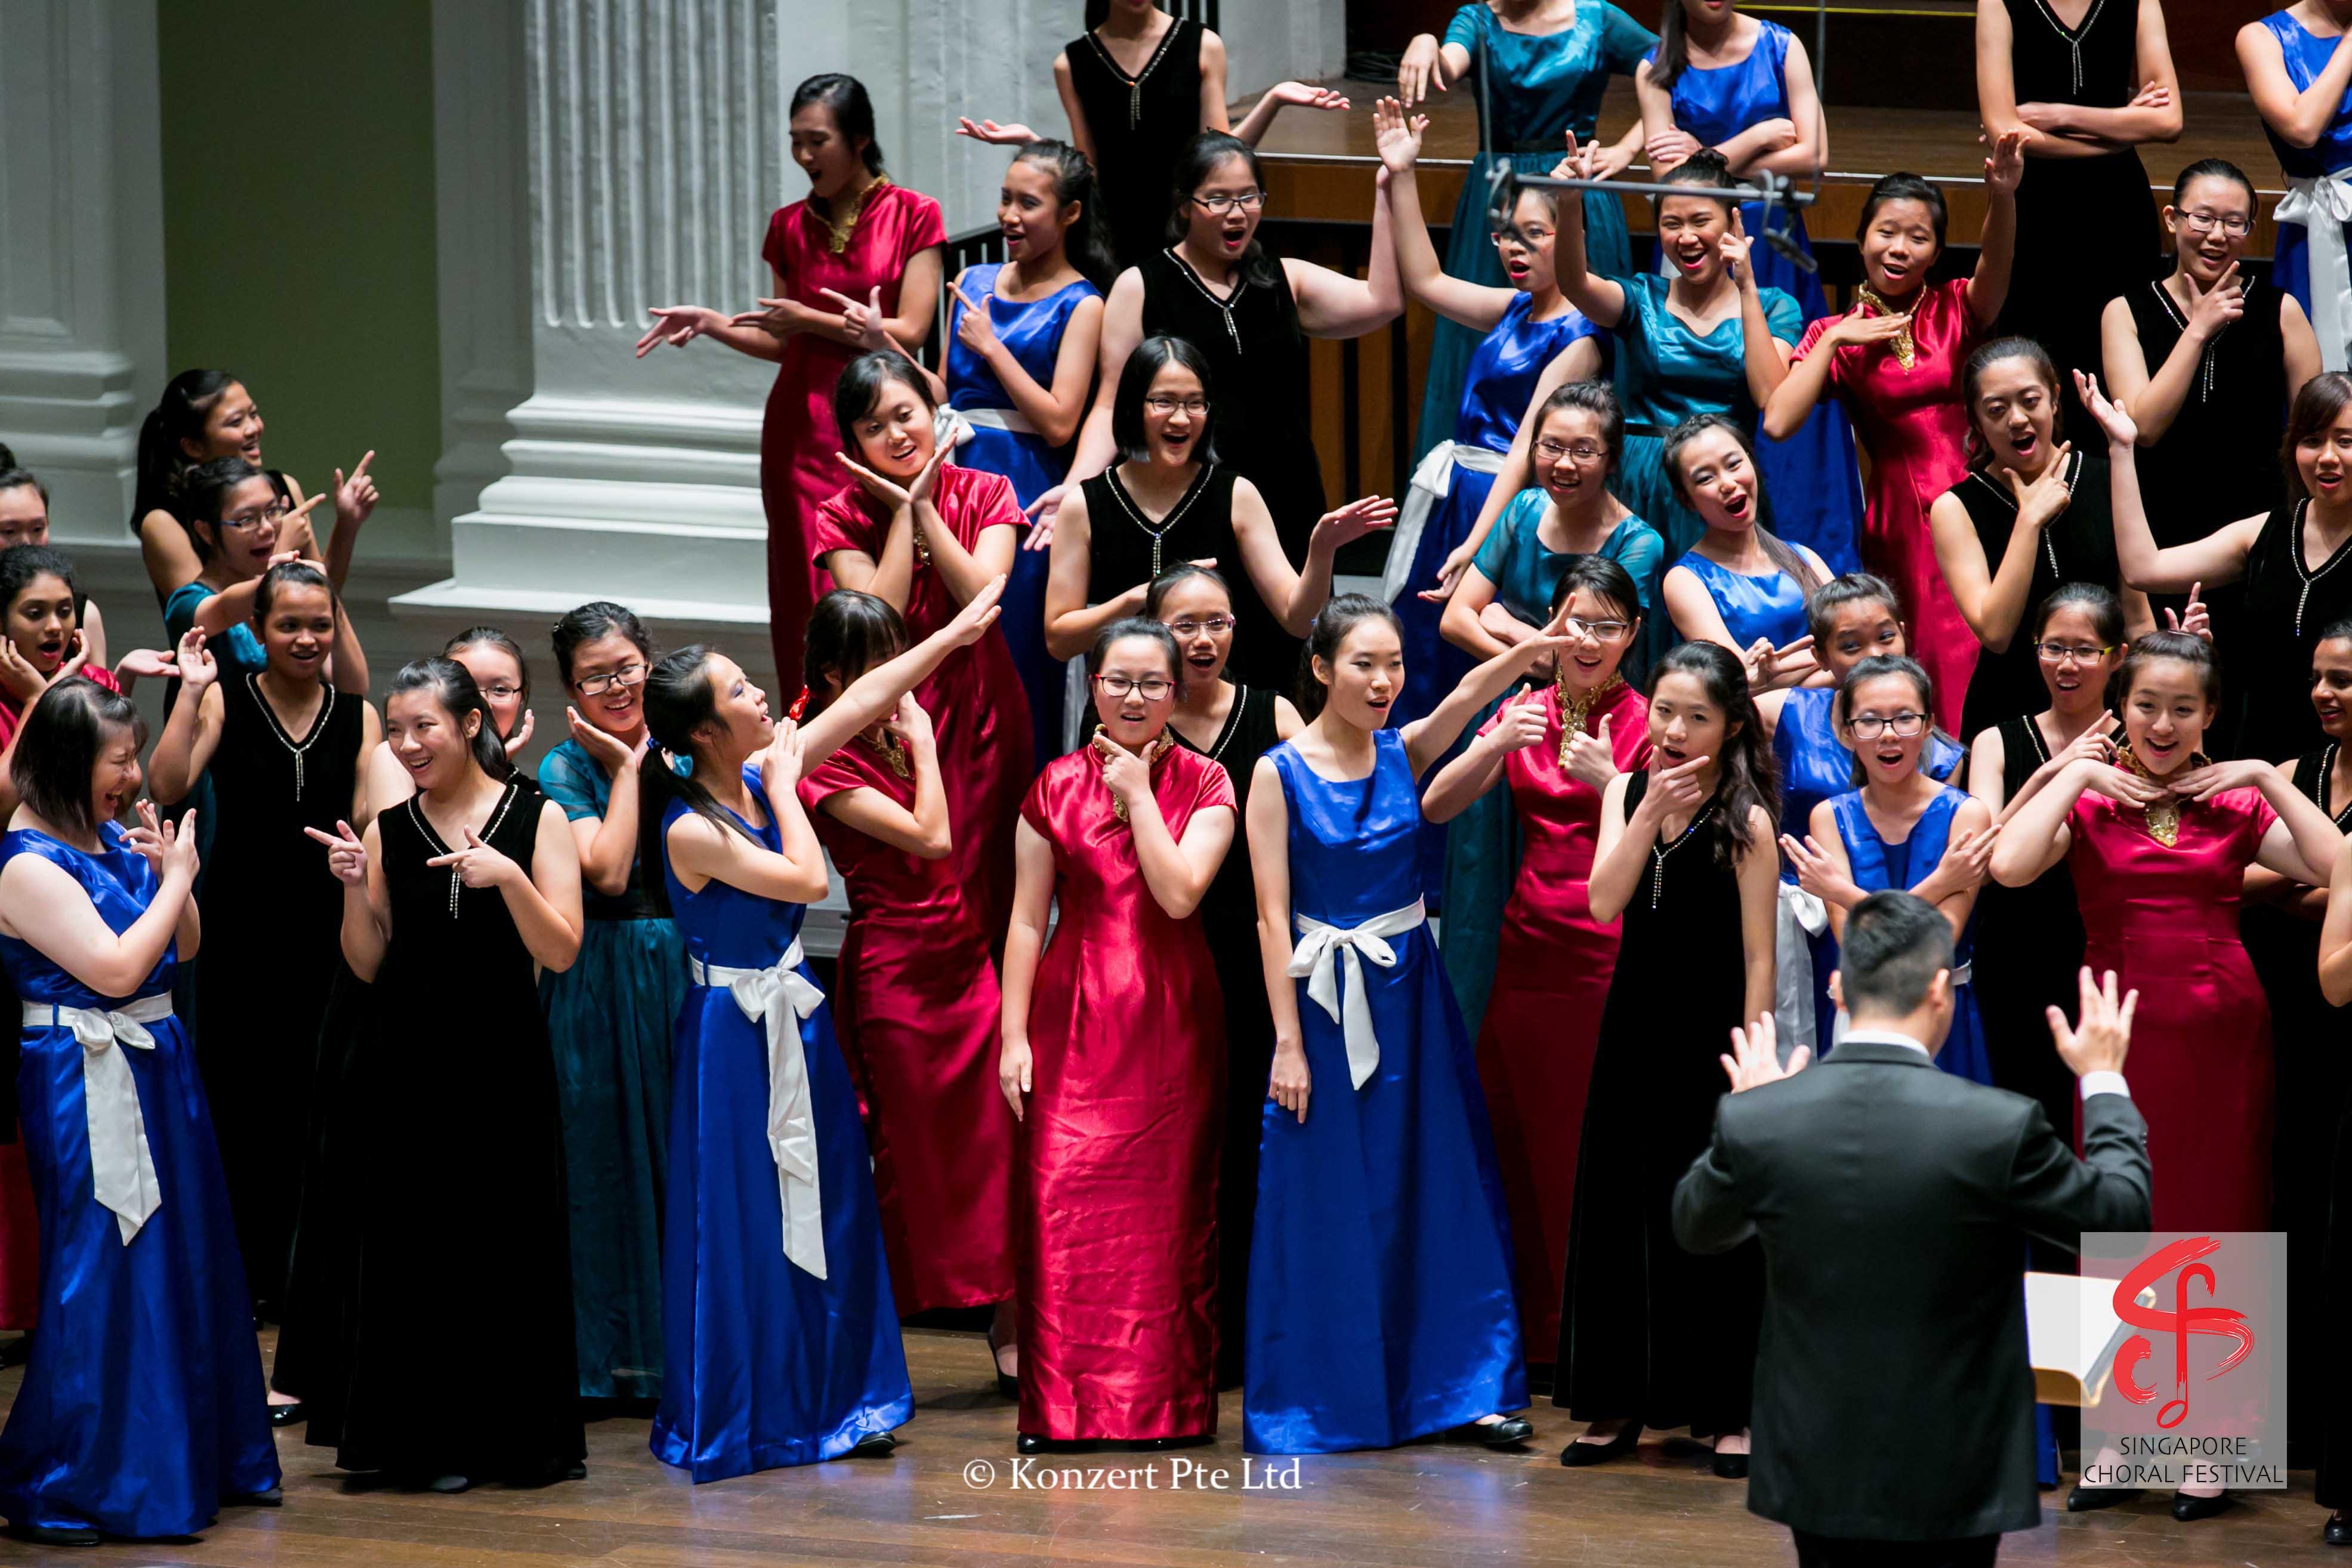 Singapore Choral Festival 7-8-15 (324).jpg